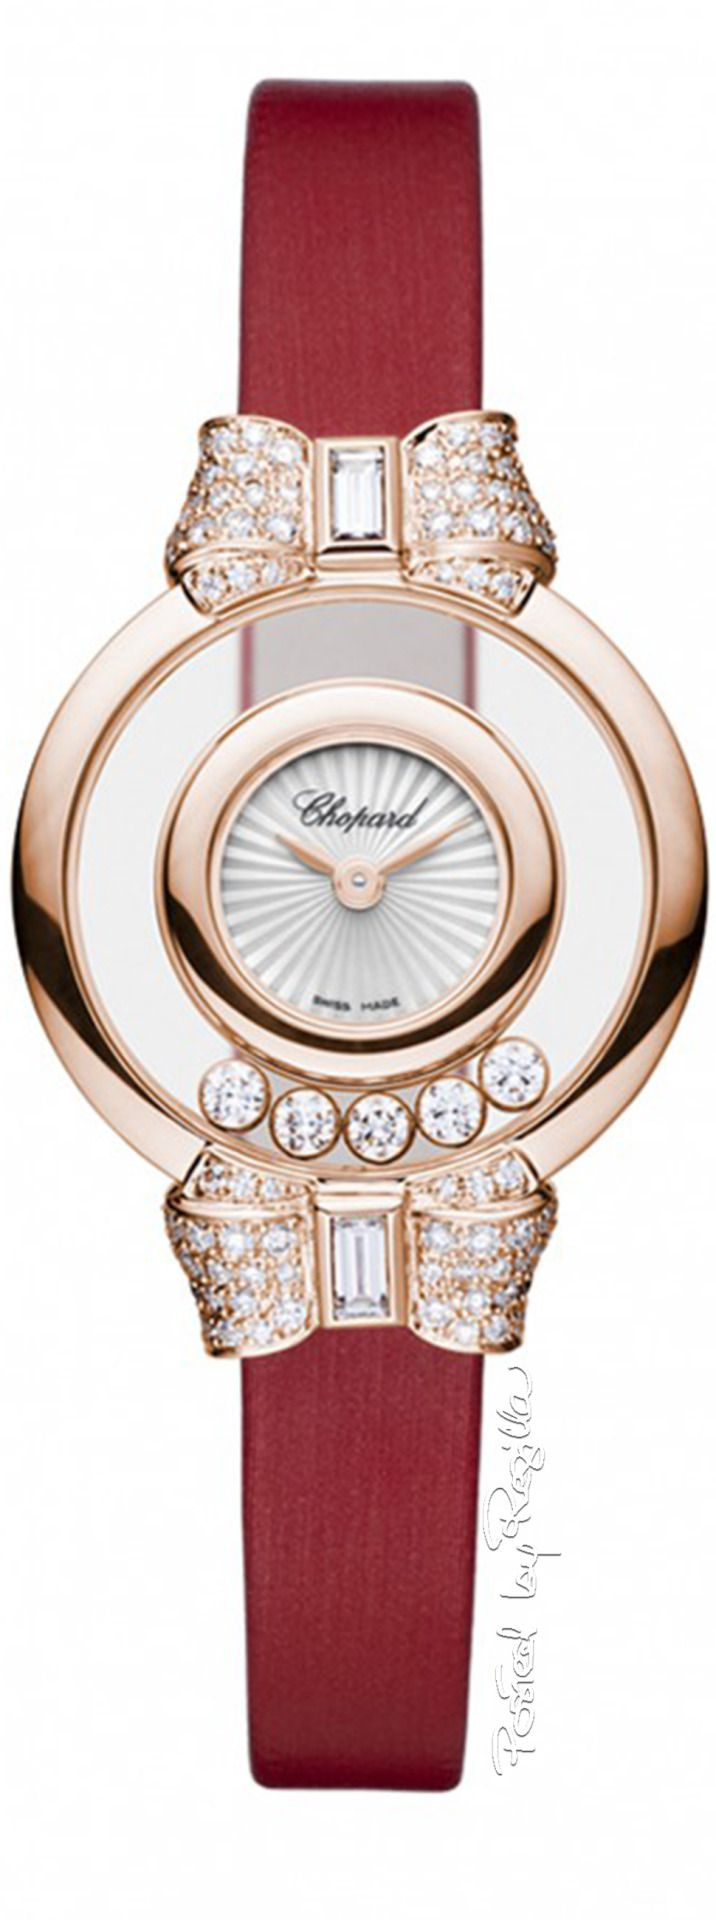 Best 25 luxury watches women ideas on pinterest ladies luxury watches designer watches and for Watches brands for lady